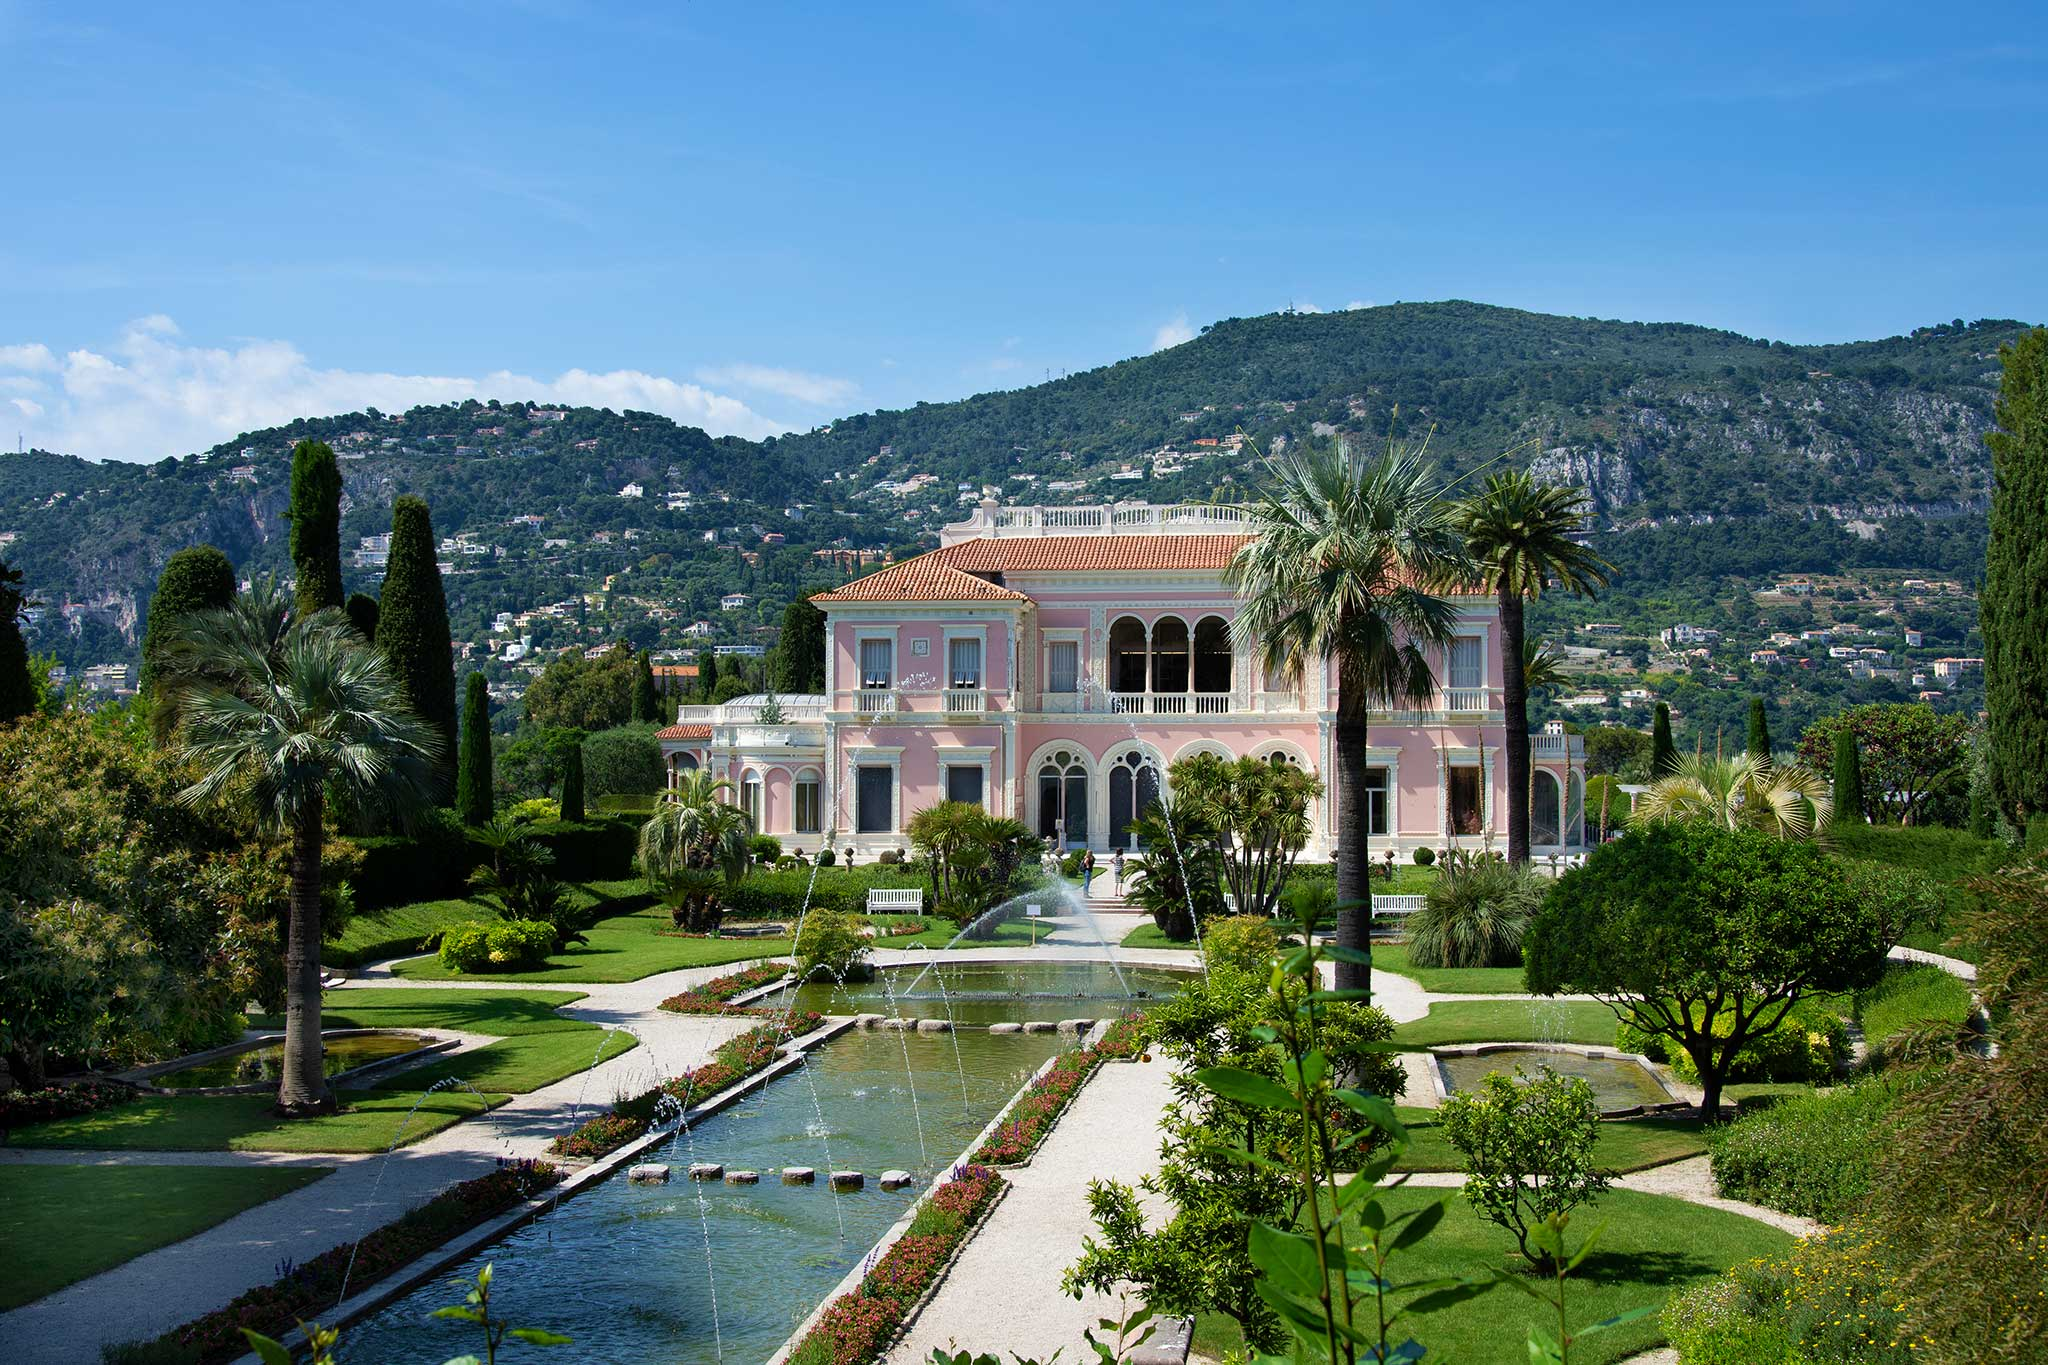 Steve and Carole in Vence - Villa Ephrussi de Rothschild